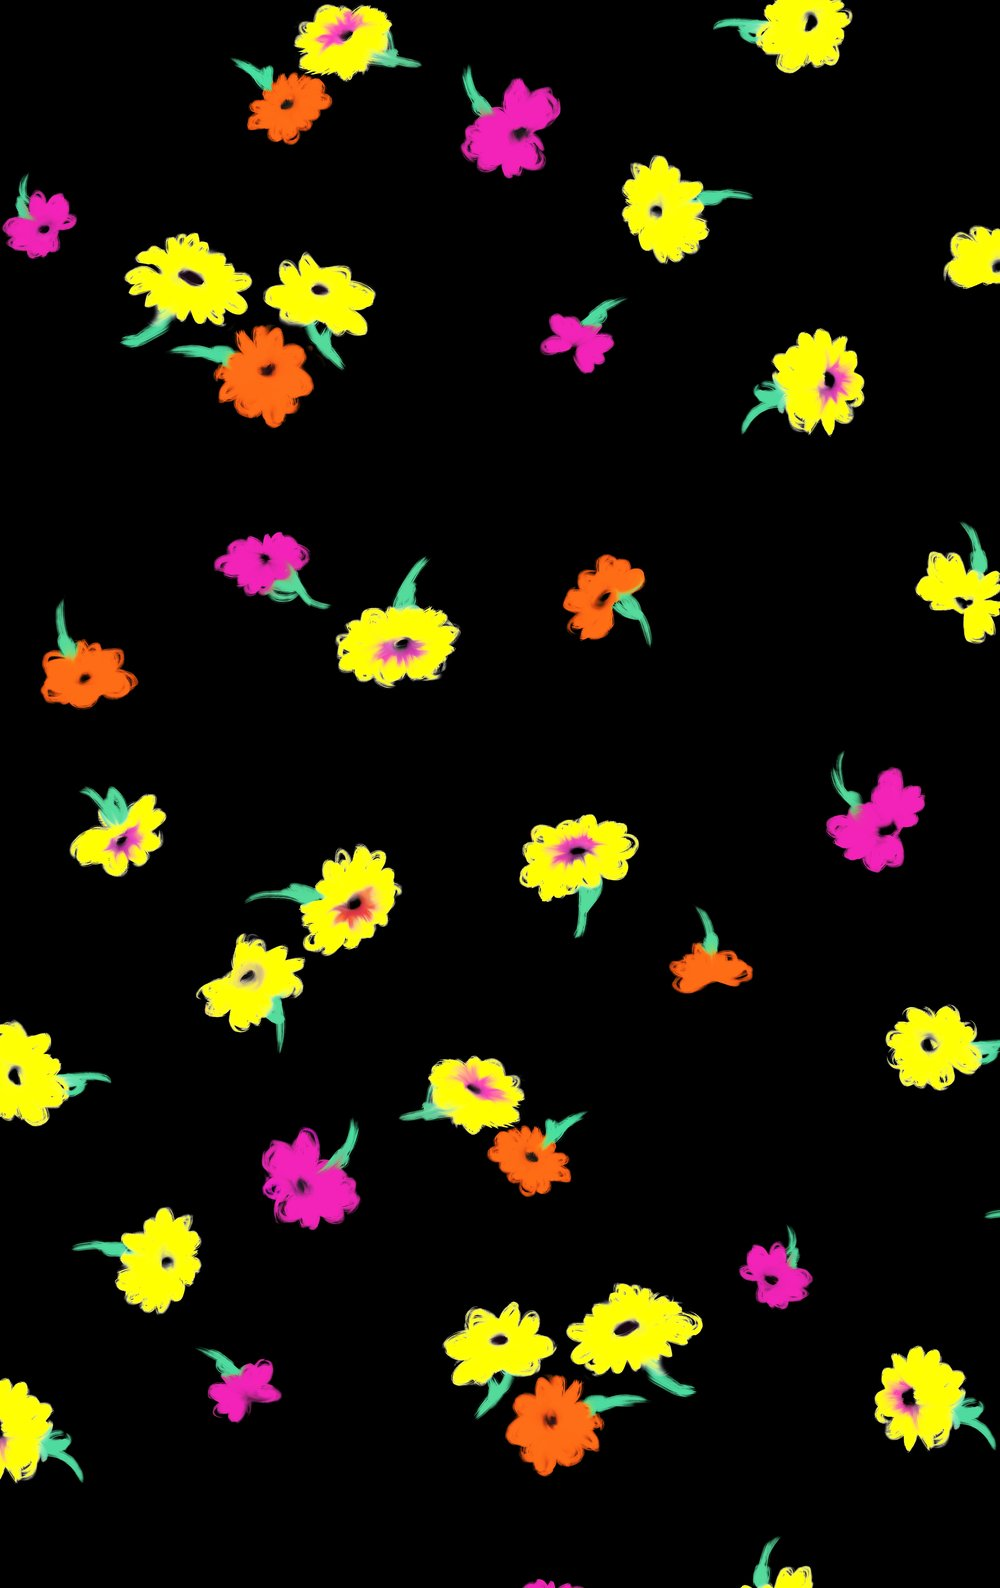 falling daisy-pinkyellow-isabelle ewing.jpg